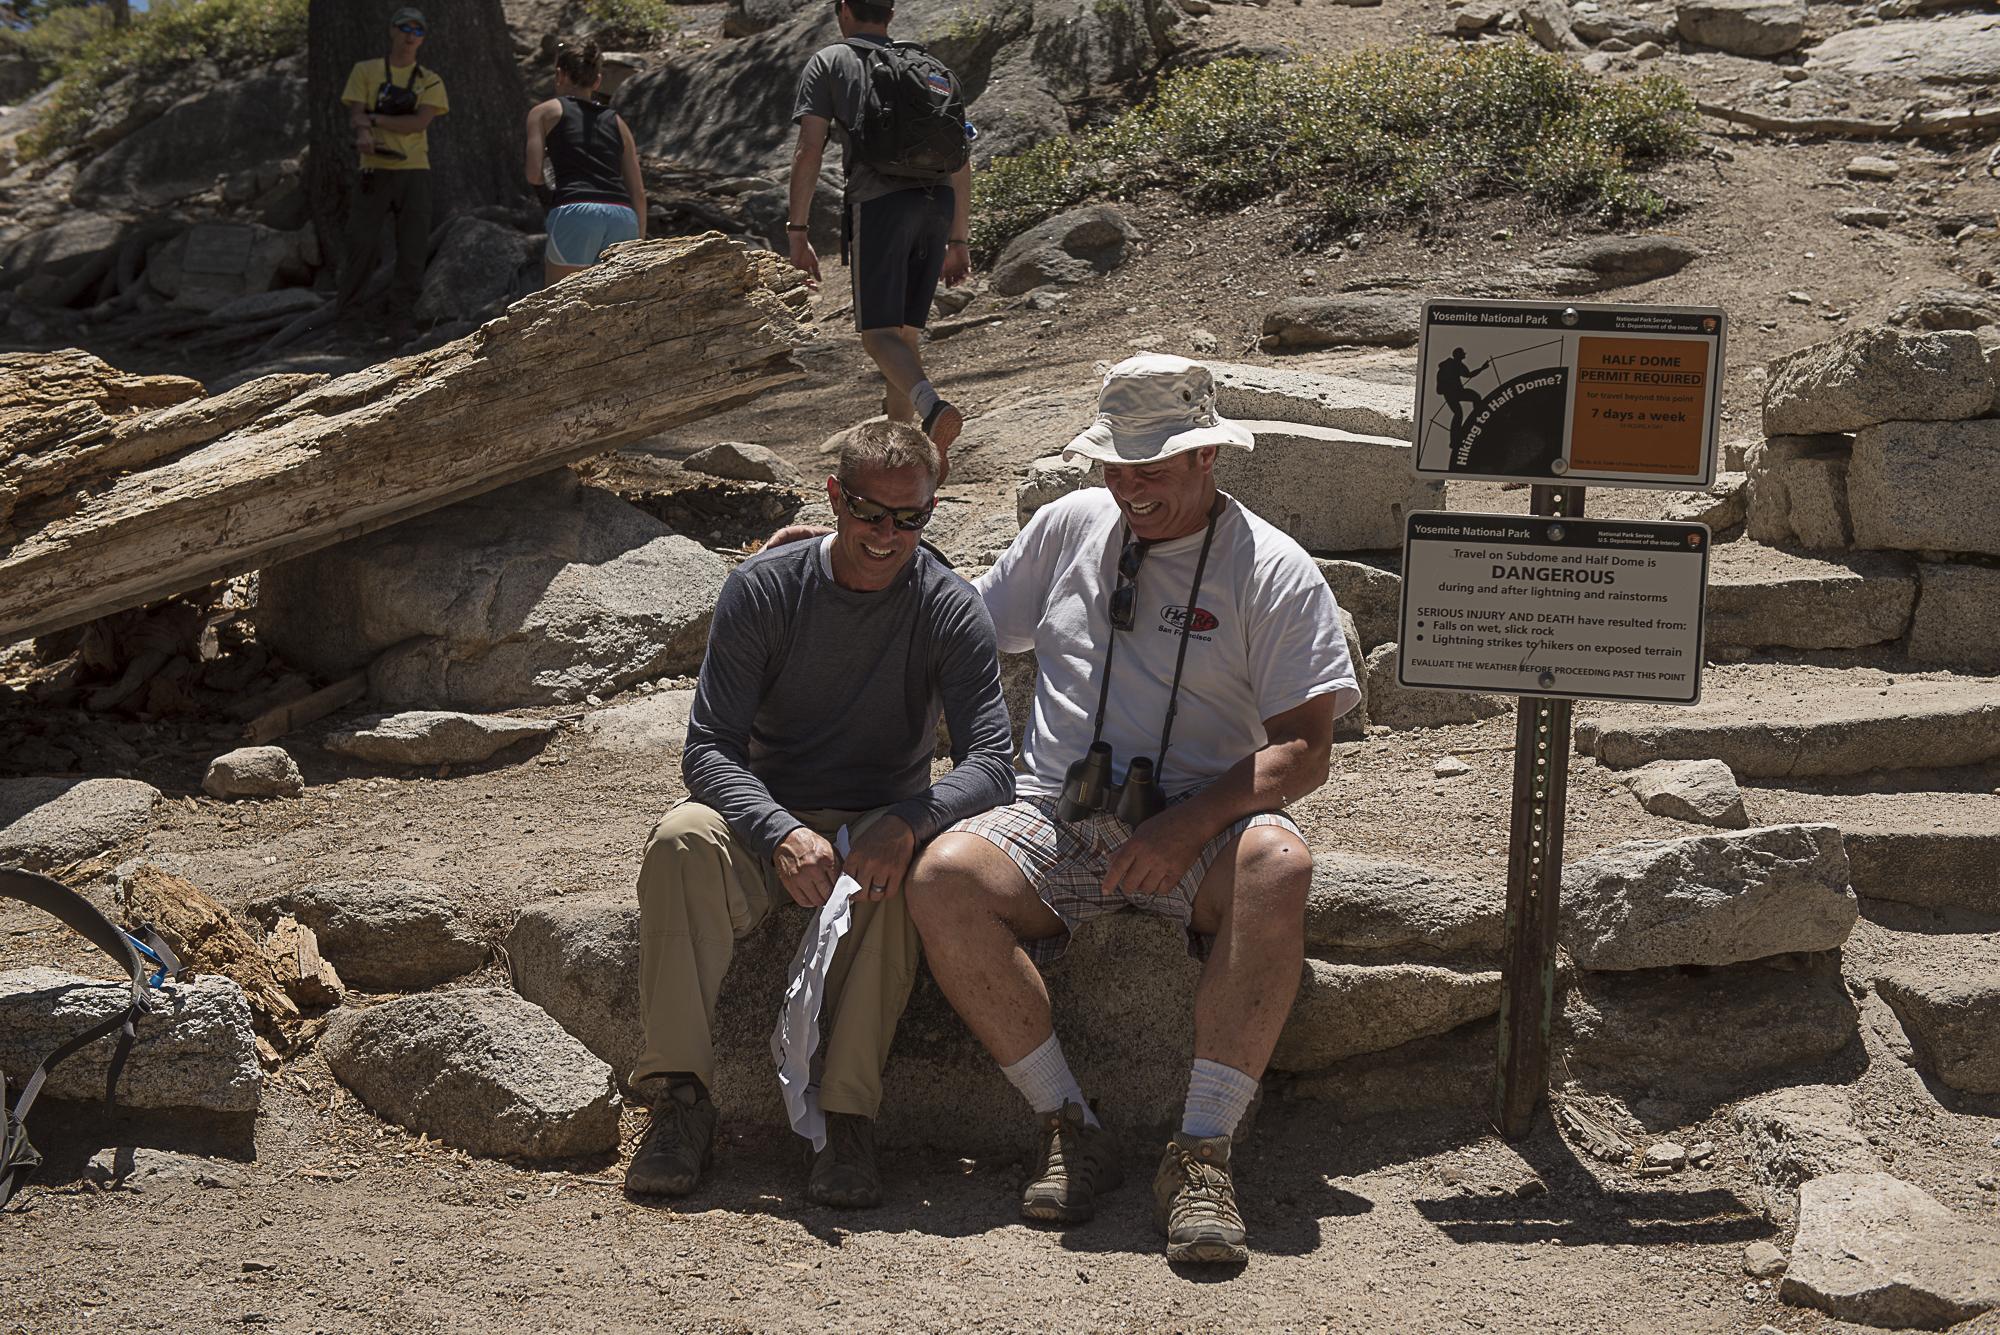 Yosemite-HalfDome-WCWKS-YExplore-DeGrazio-JUN2016-17